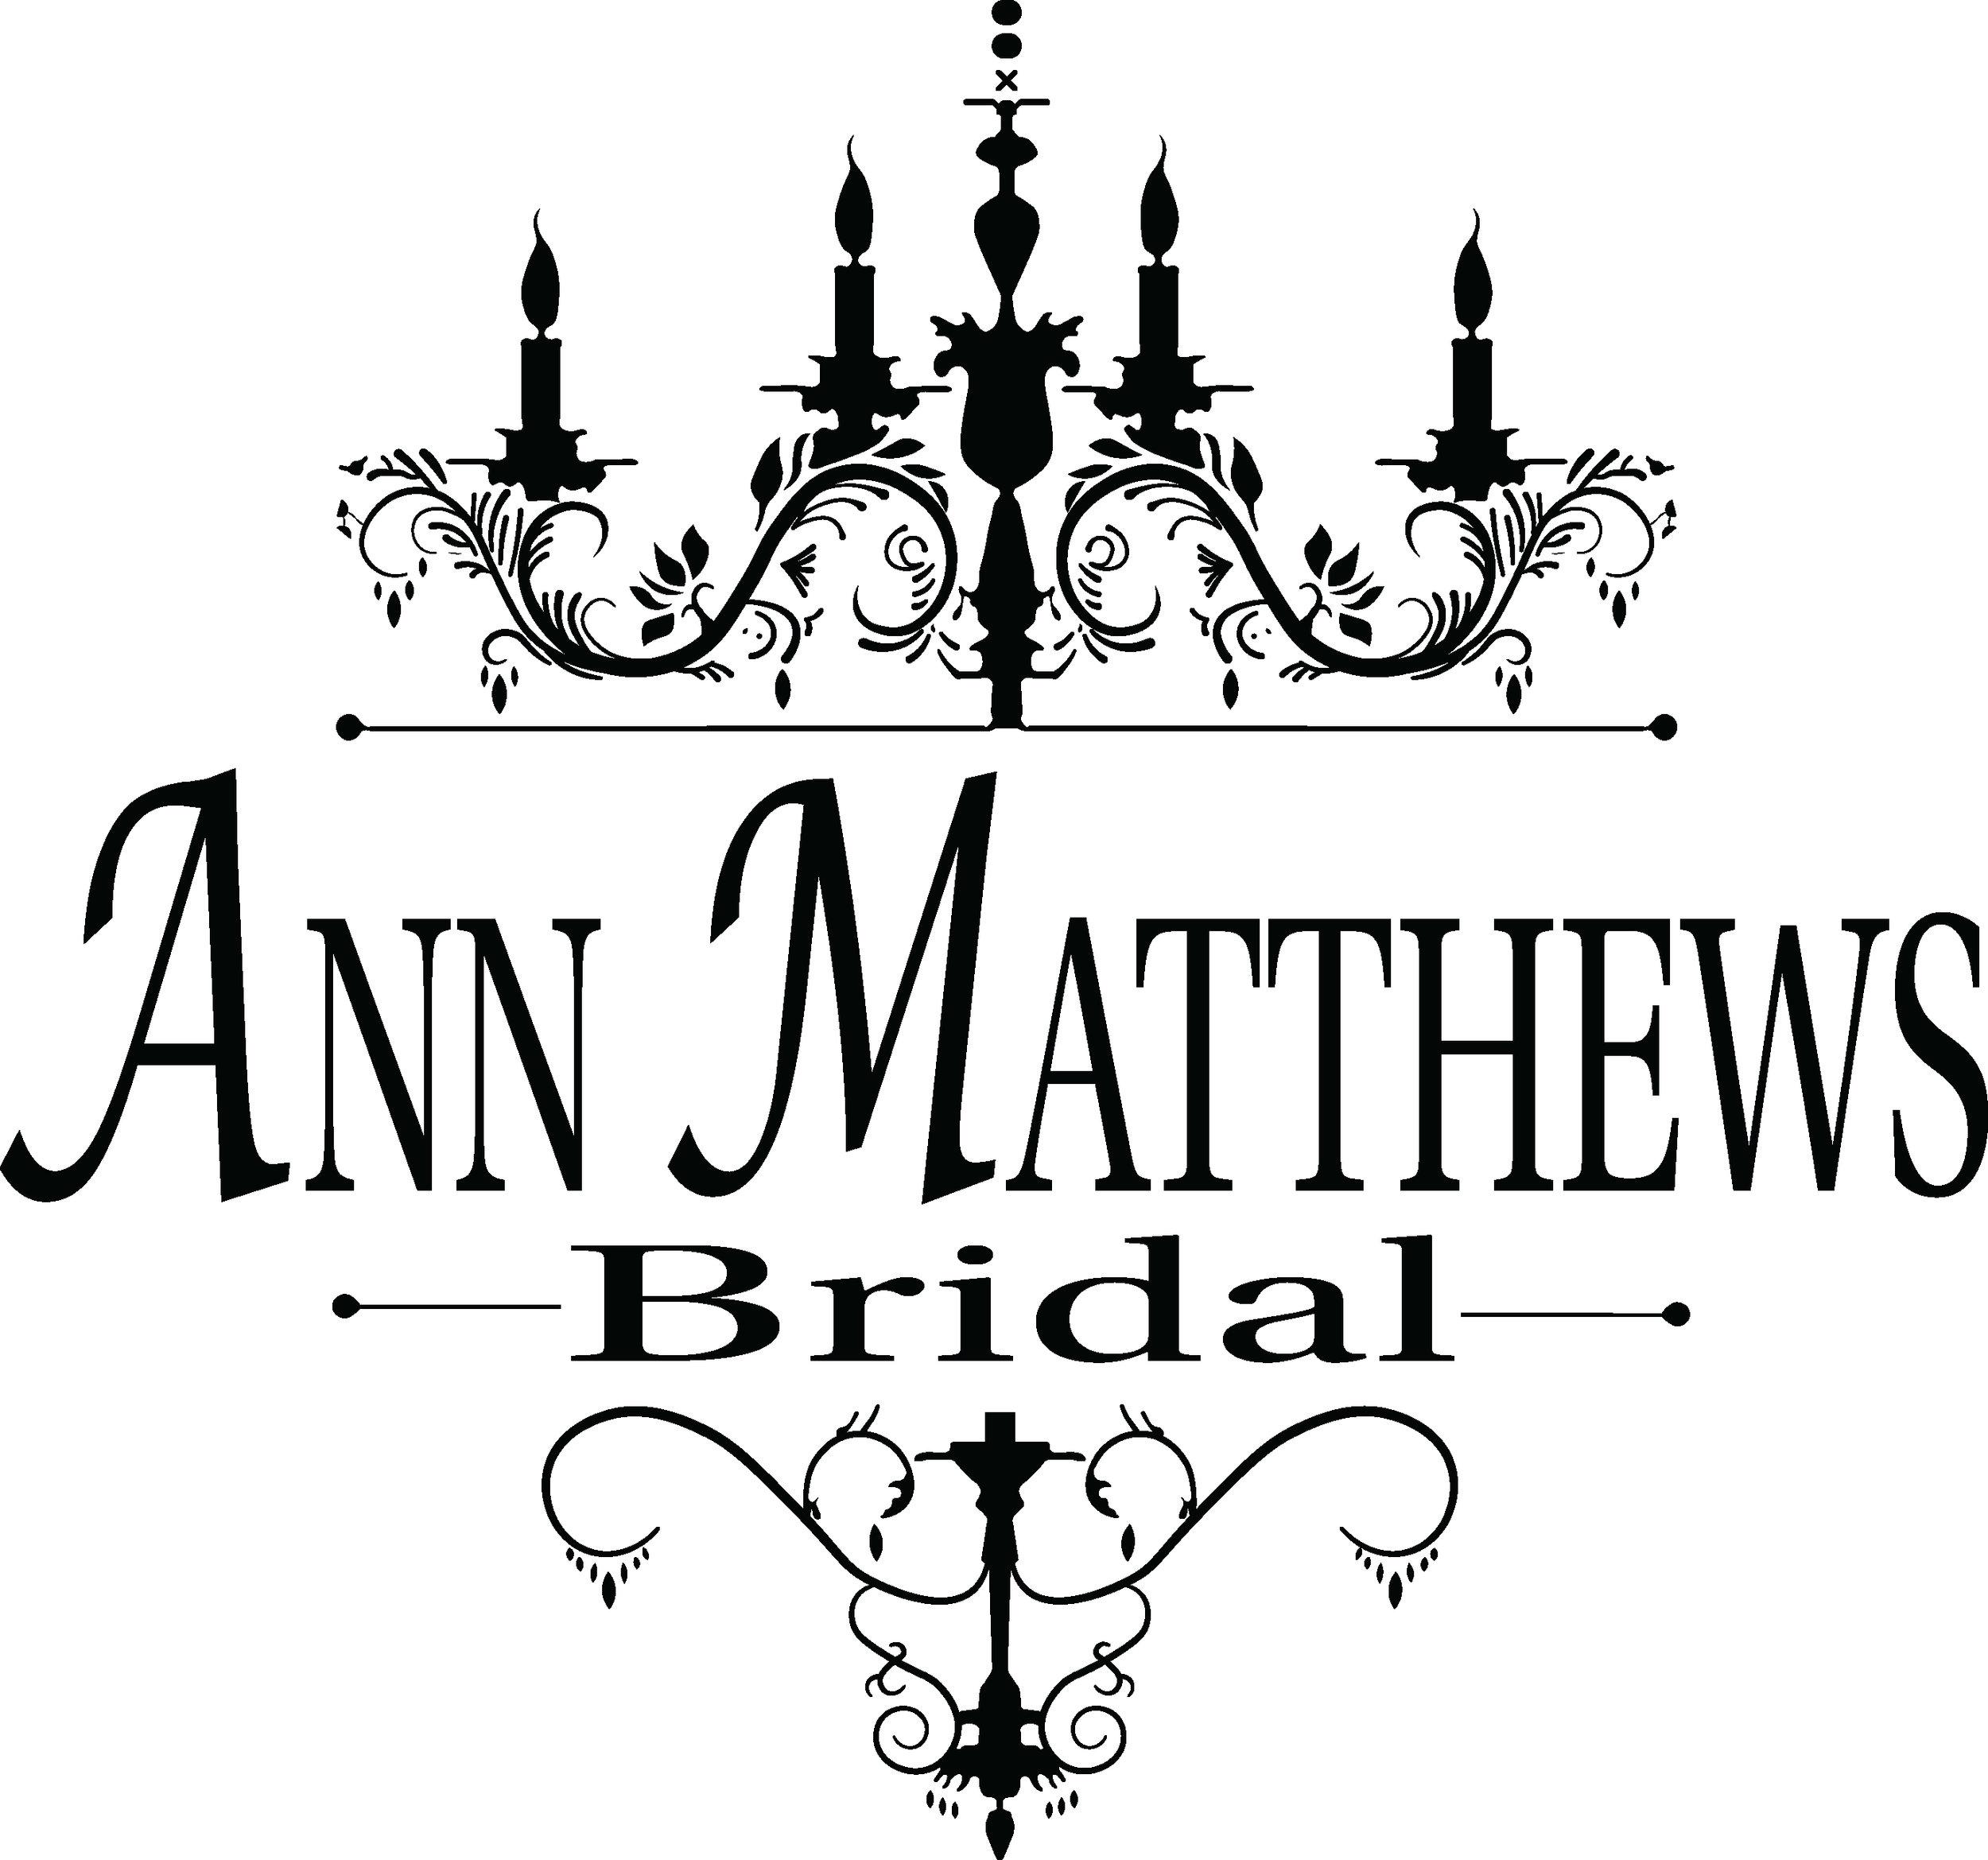 Ann Matthews Bridal Logo Bags-Uline4.jpg